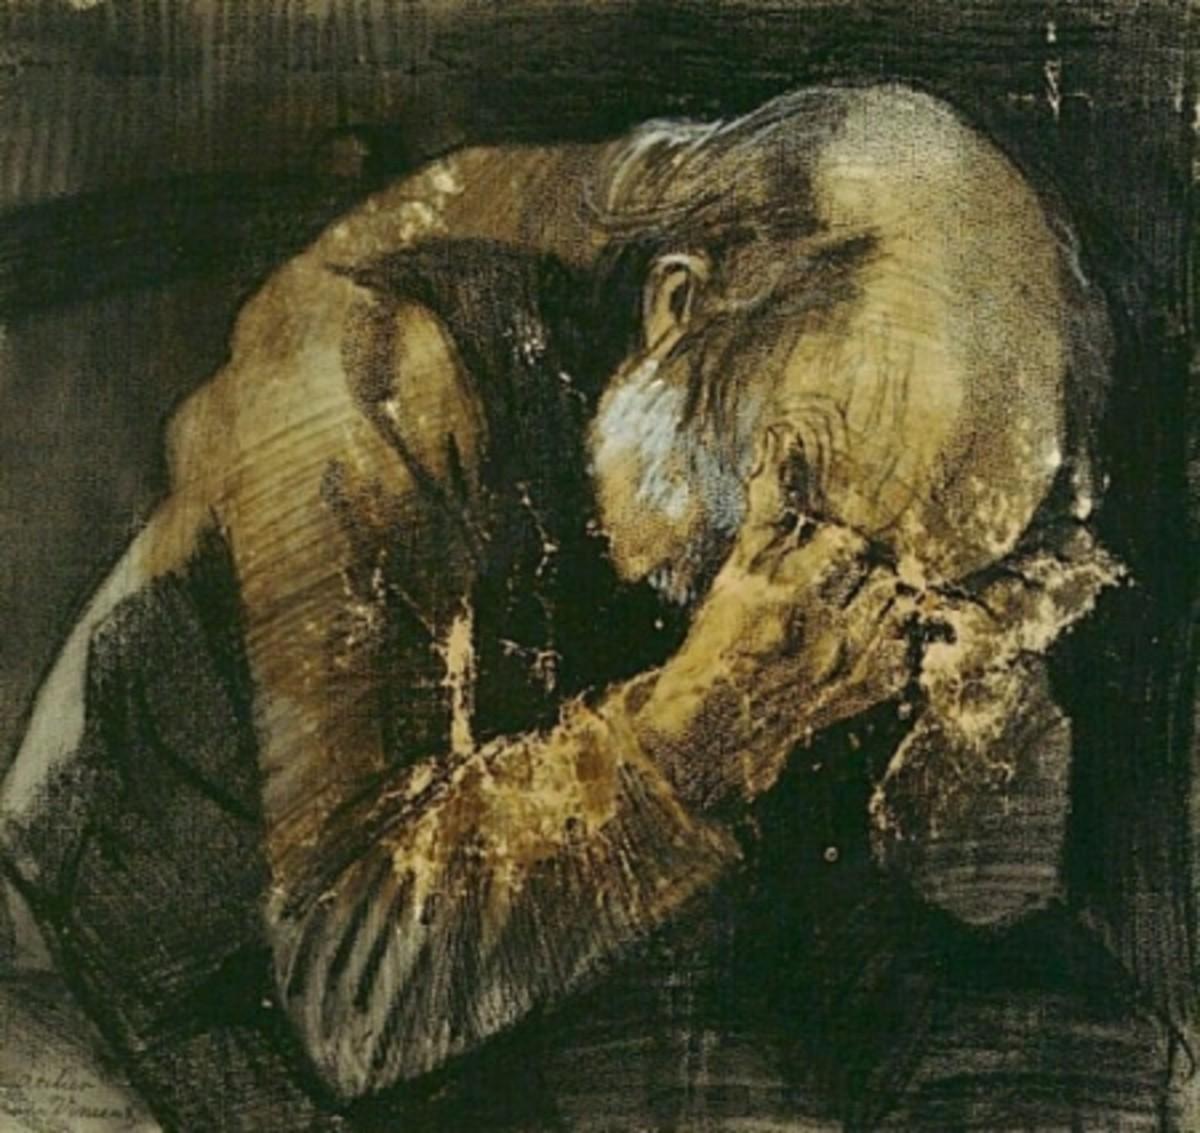 Sorrowful Old Man / Vincent van Gogh / Public domain